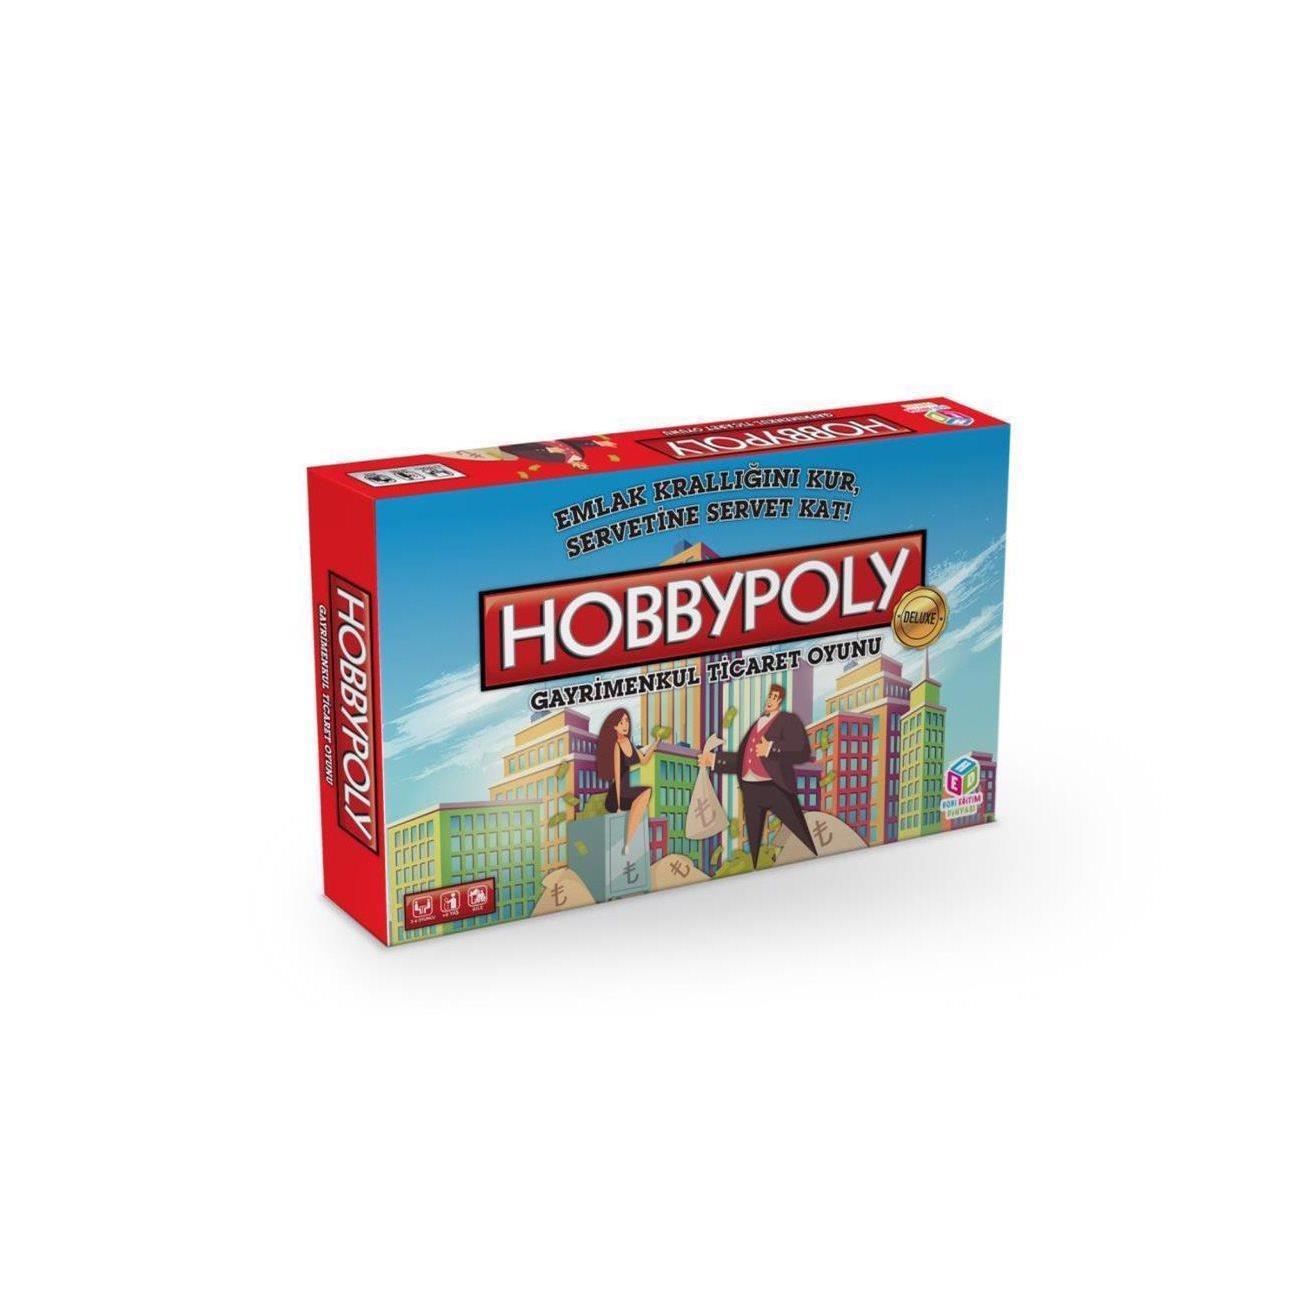 Hobbypoly Gayrimenkul Ticaret Oyunu